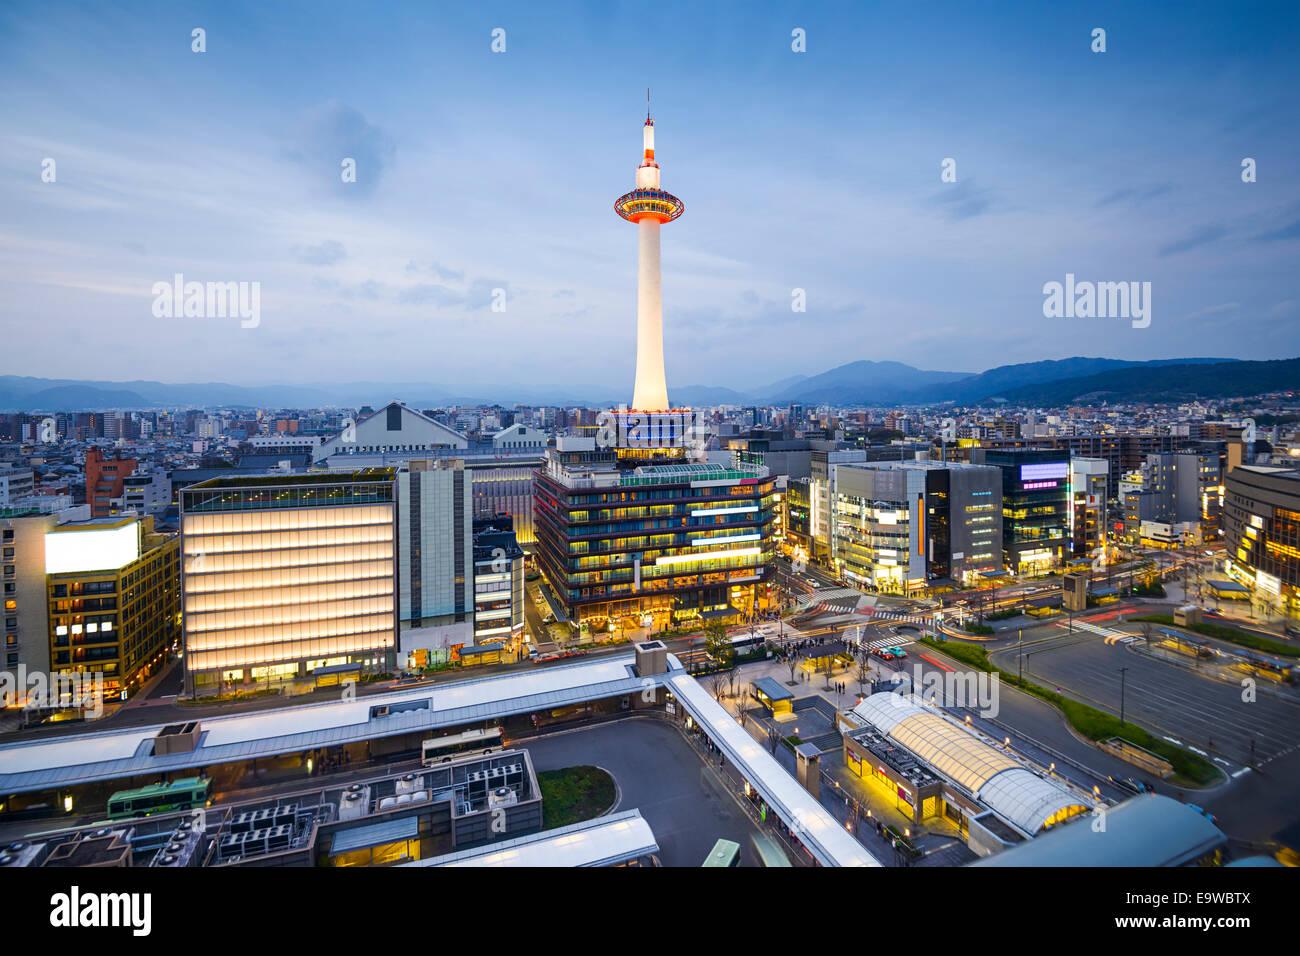 Kyoto, Japan downtown city skyline. - Stock Image